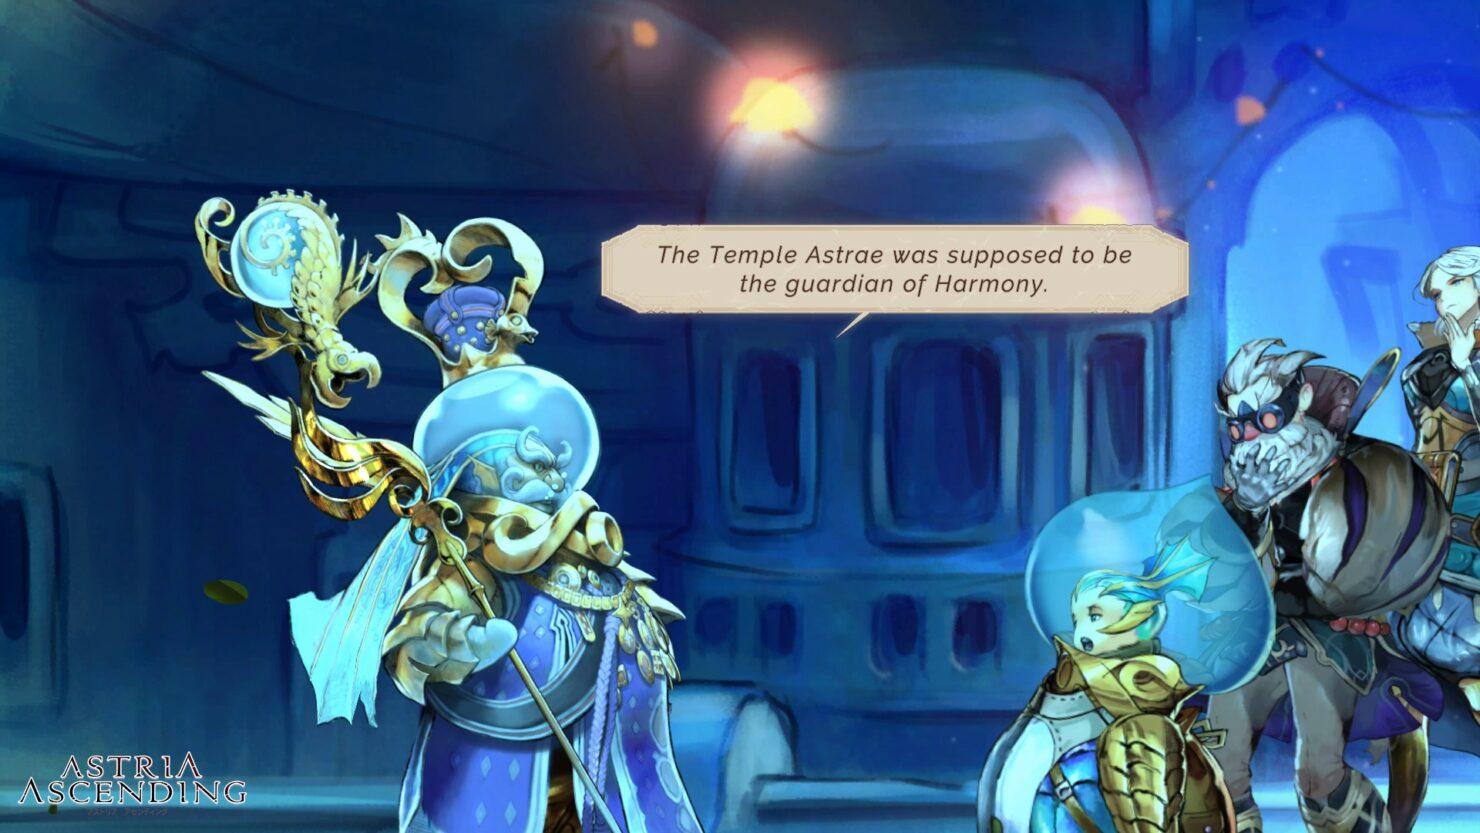 astria-ascending-announced-02-screenshot-06